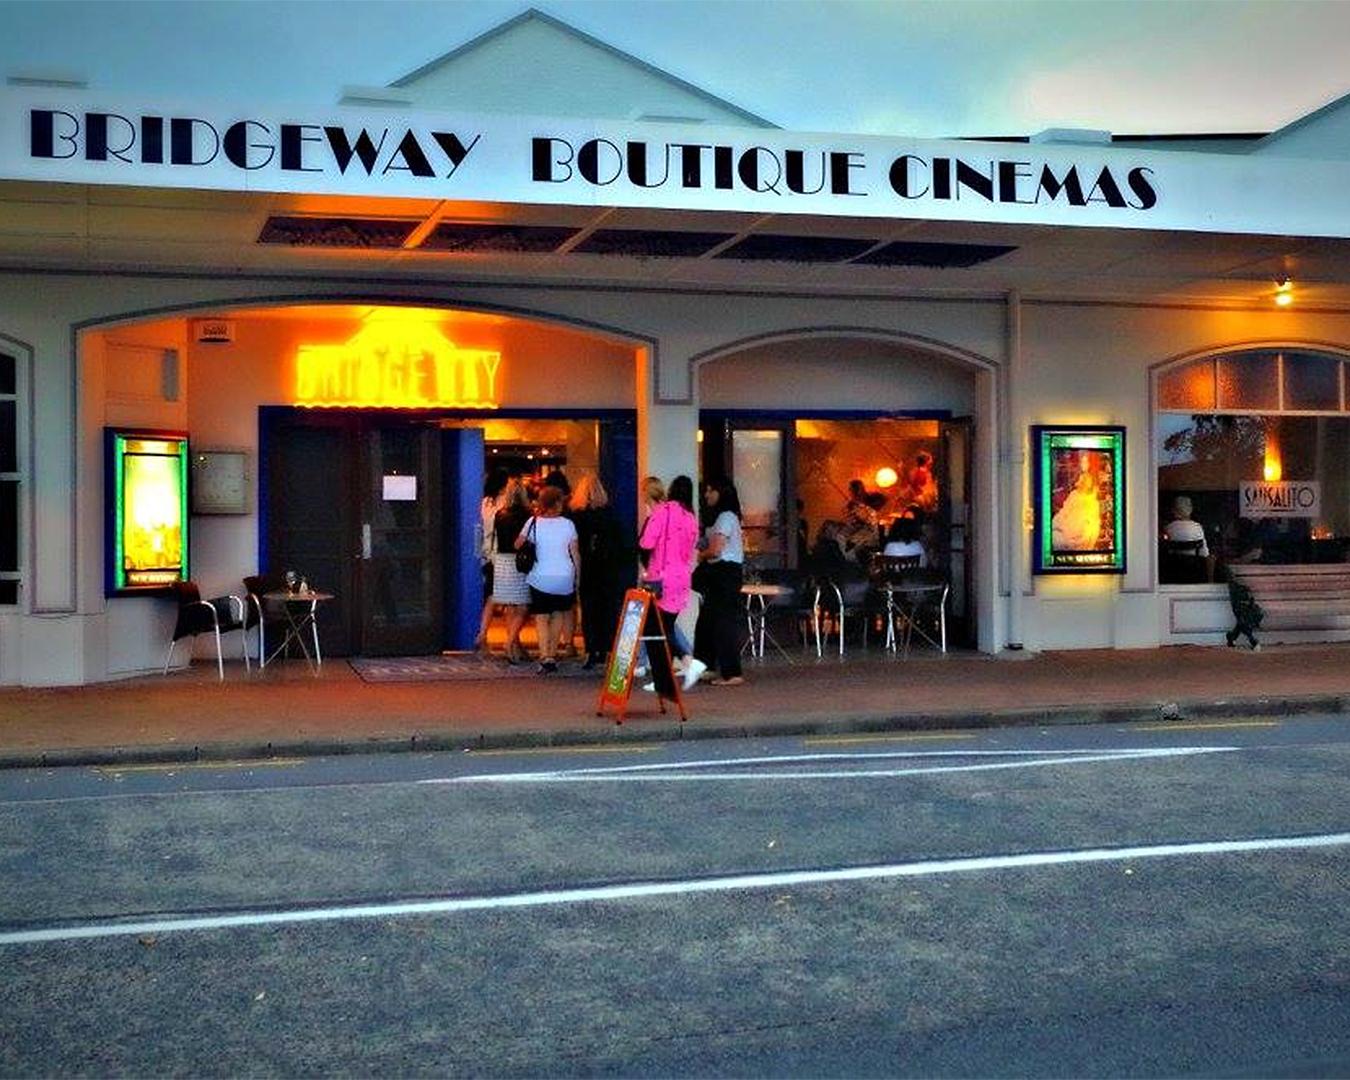 The outside of the Bridgeway boutique cinema.